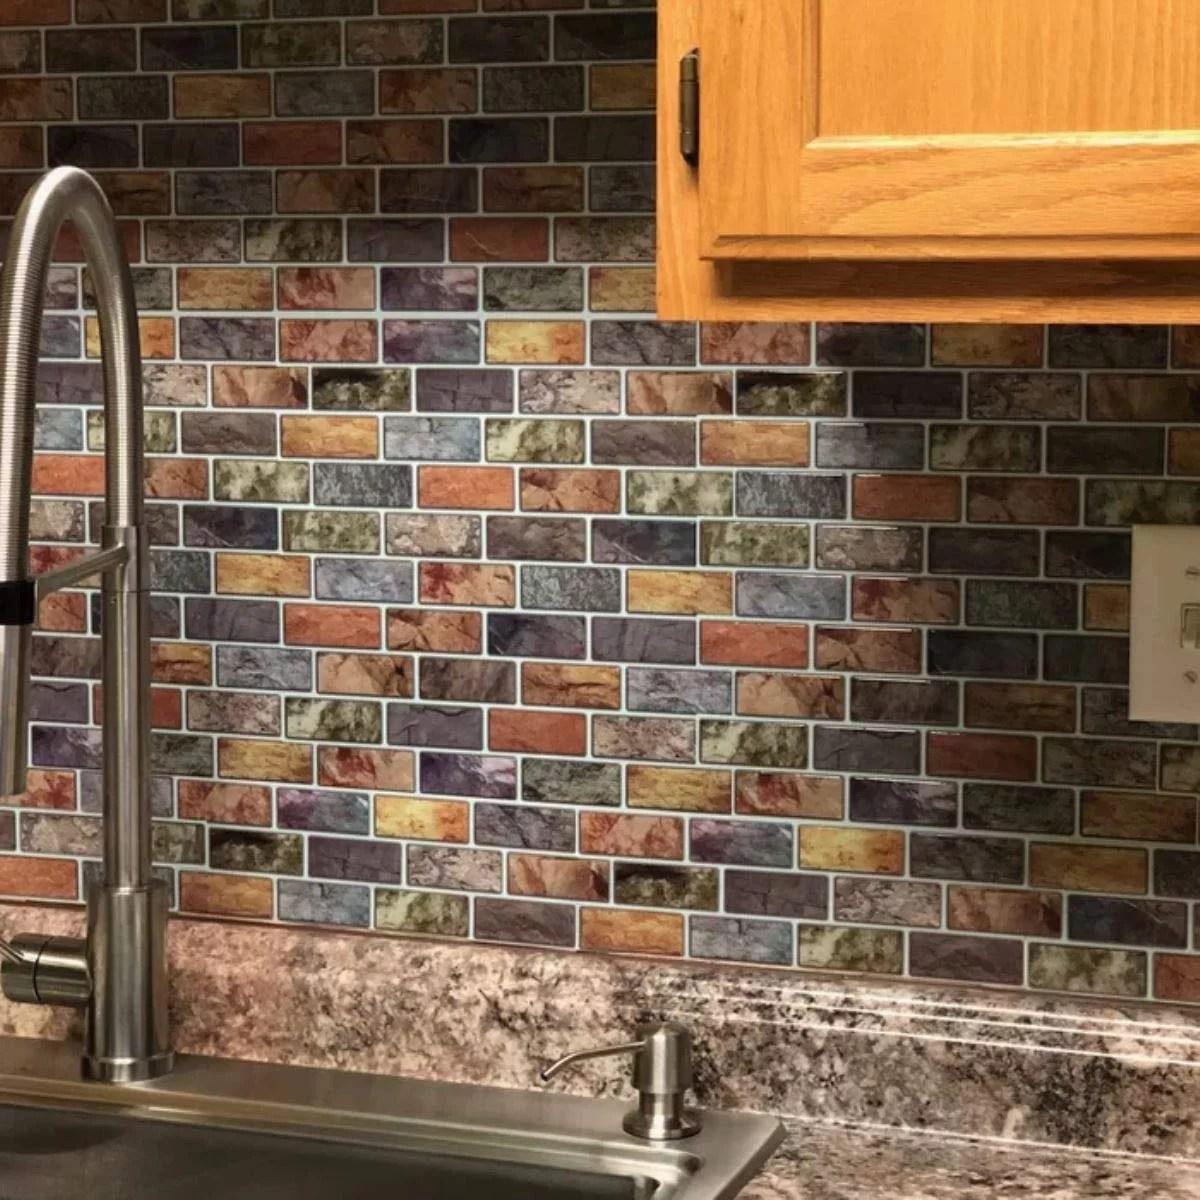 art3d 10 sheet peel stick kitchen backsplash sticker 12 x 12 faux ceramic tile design